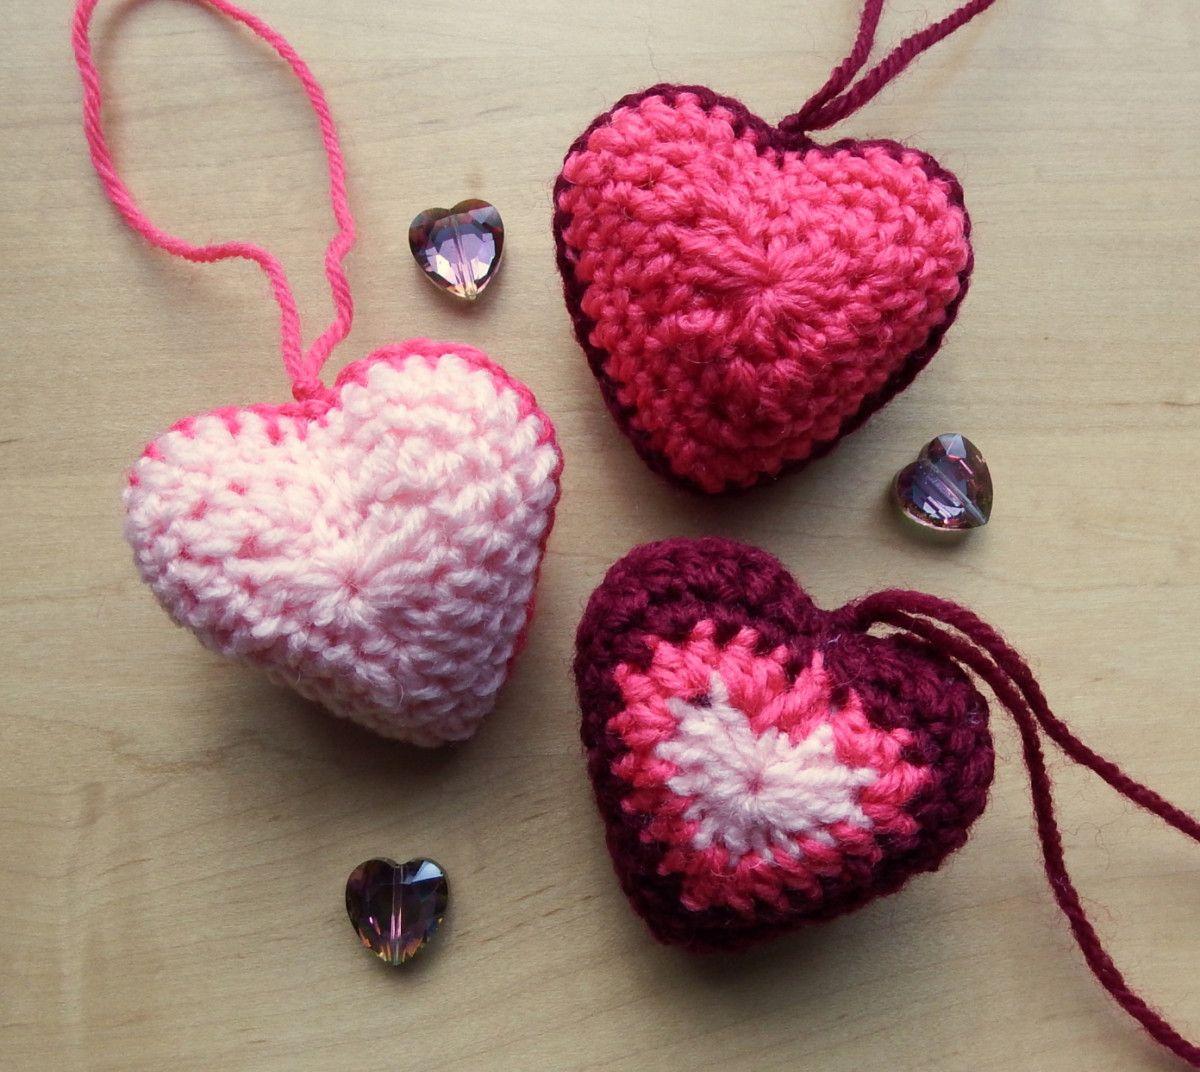 Crochet 3D Heart Pattern Video Tutorial   Hanging hearts, Free ...